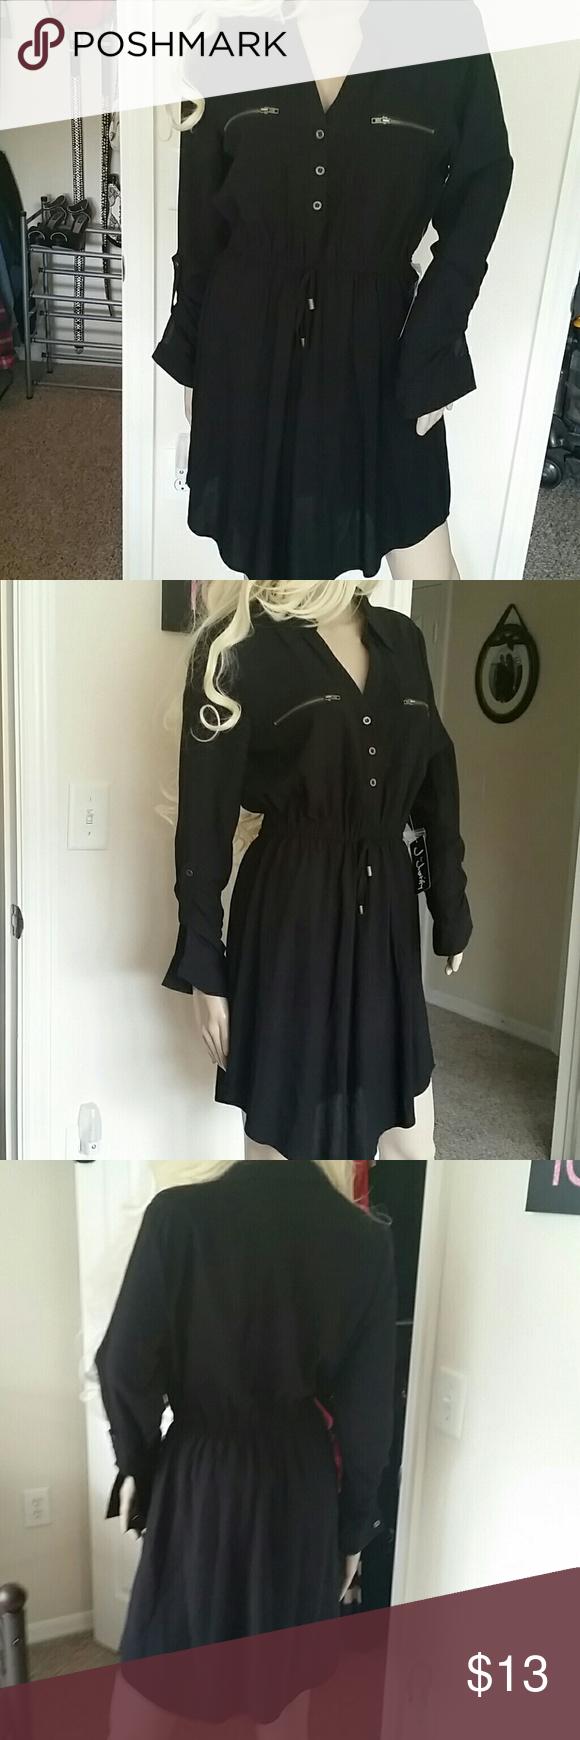 Black shirt dress nwt size l juniors j for justify black shirt dress